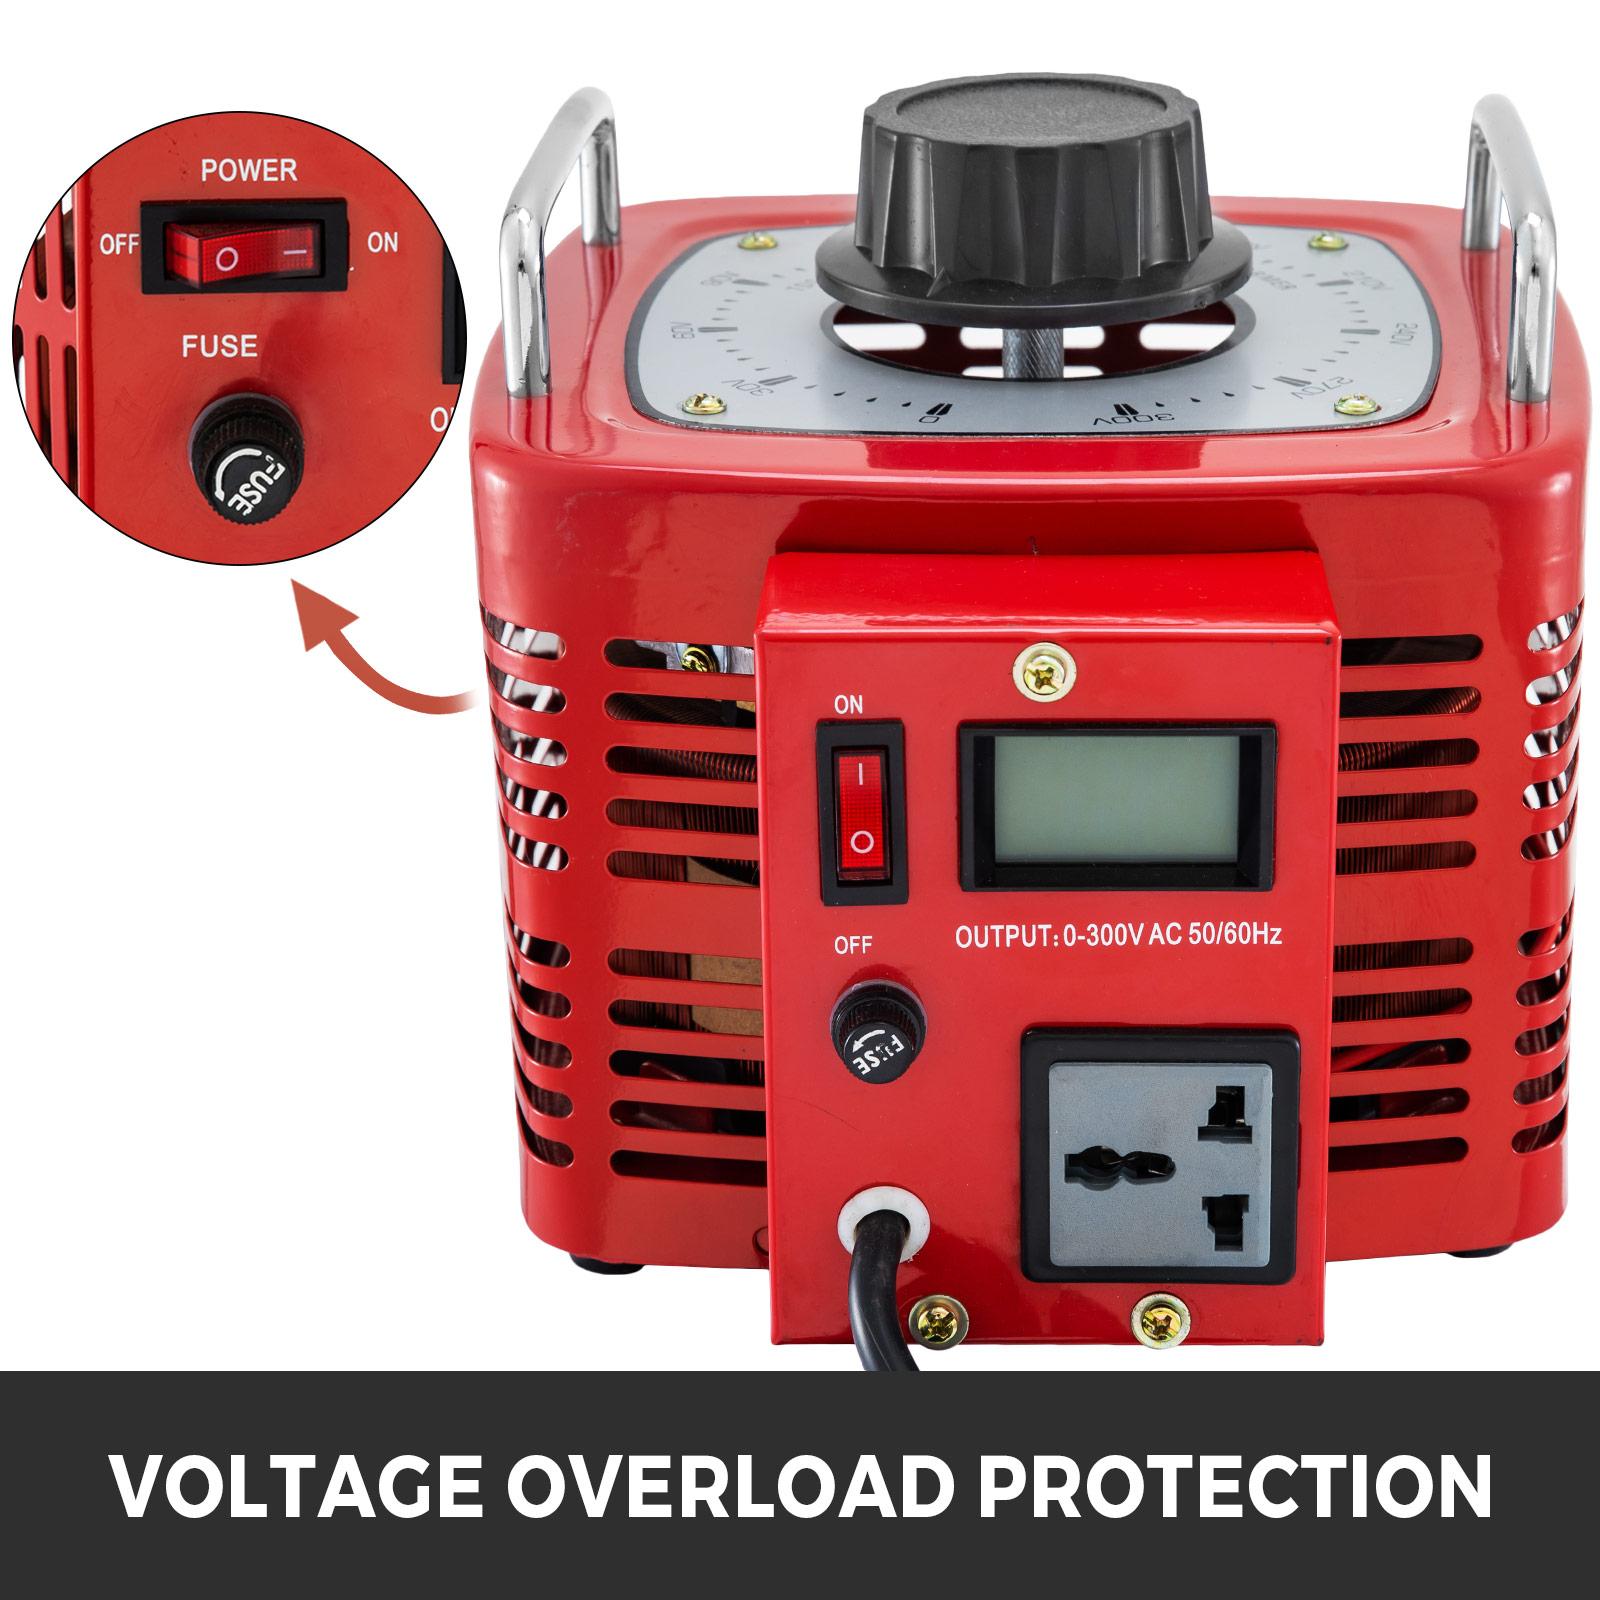 Auto-Variac-Variable-Transformer-0-5-1-2-3KVA-Regulator-pure-copper-coil-220V thumbnail 66